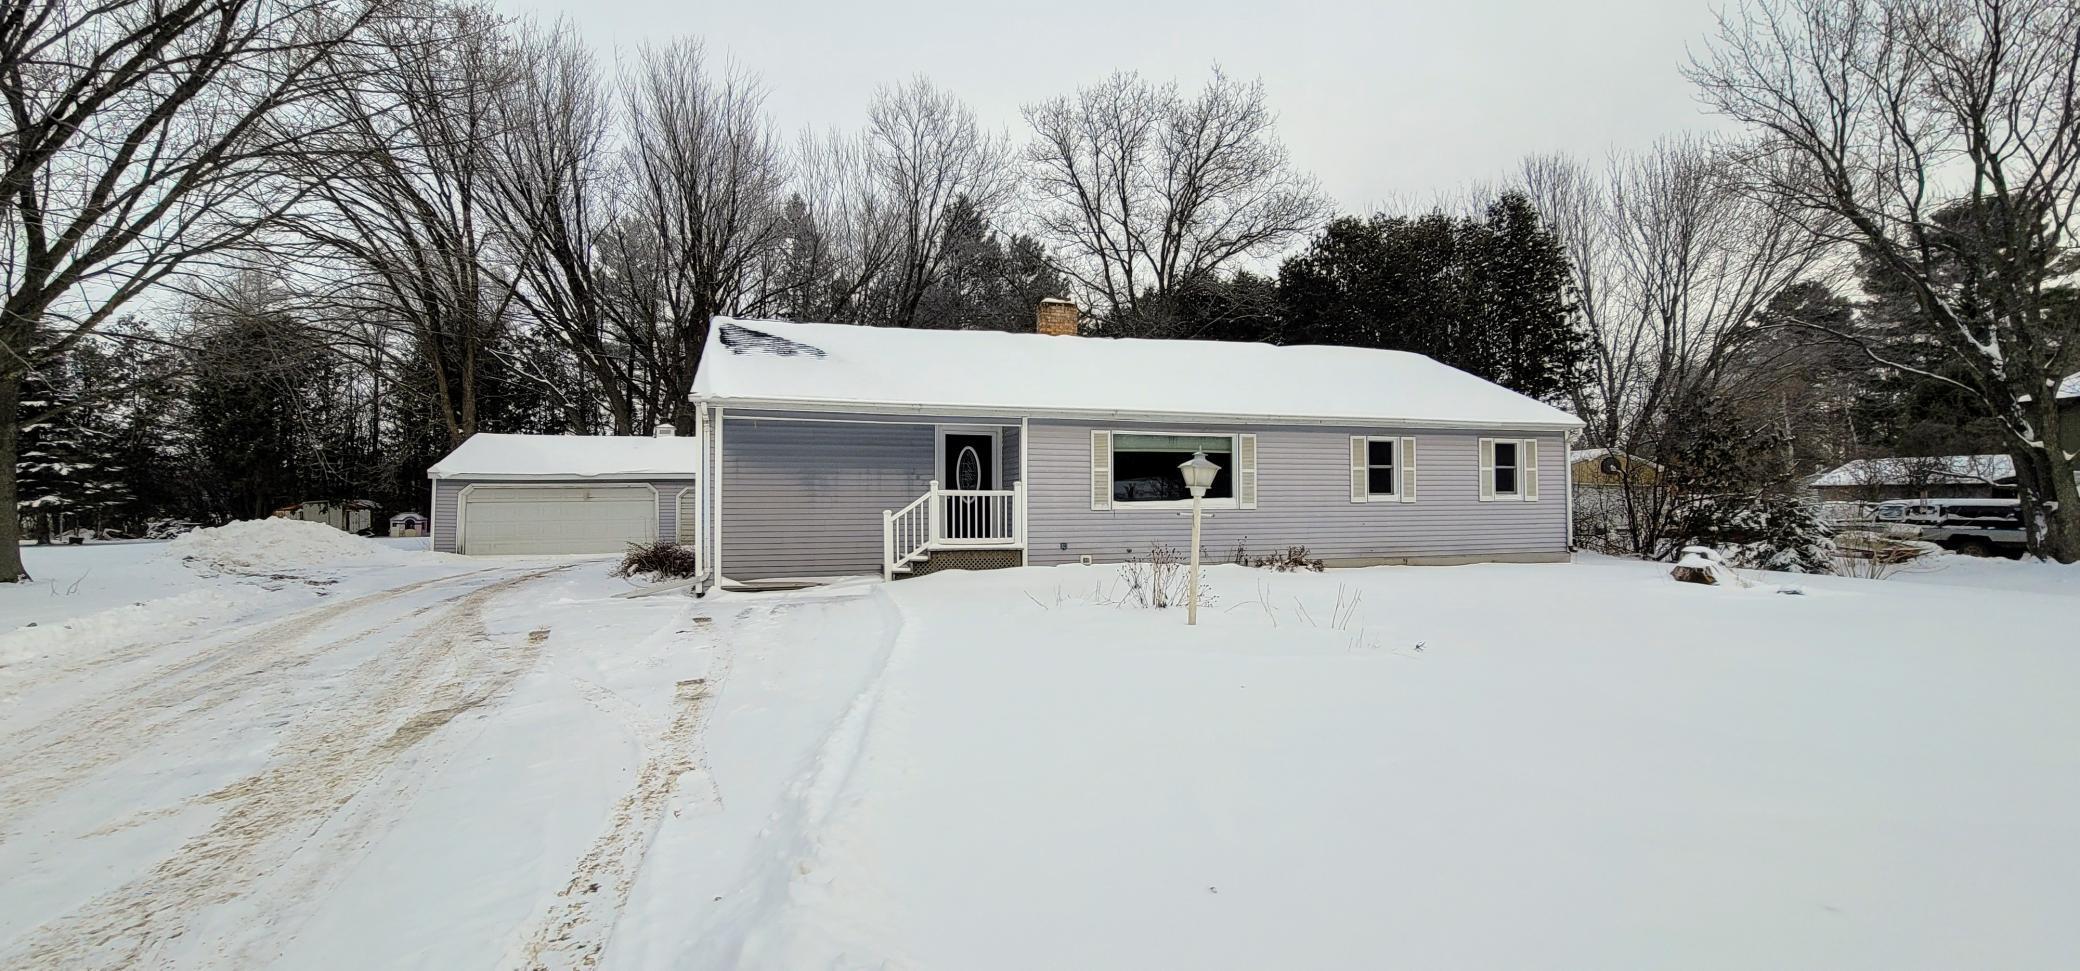 3475 Brogade Property Photo - Askov, MN real estate listing